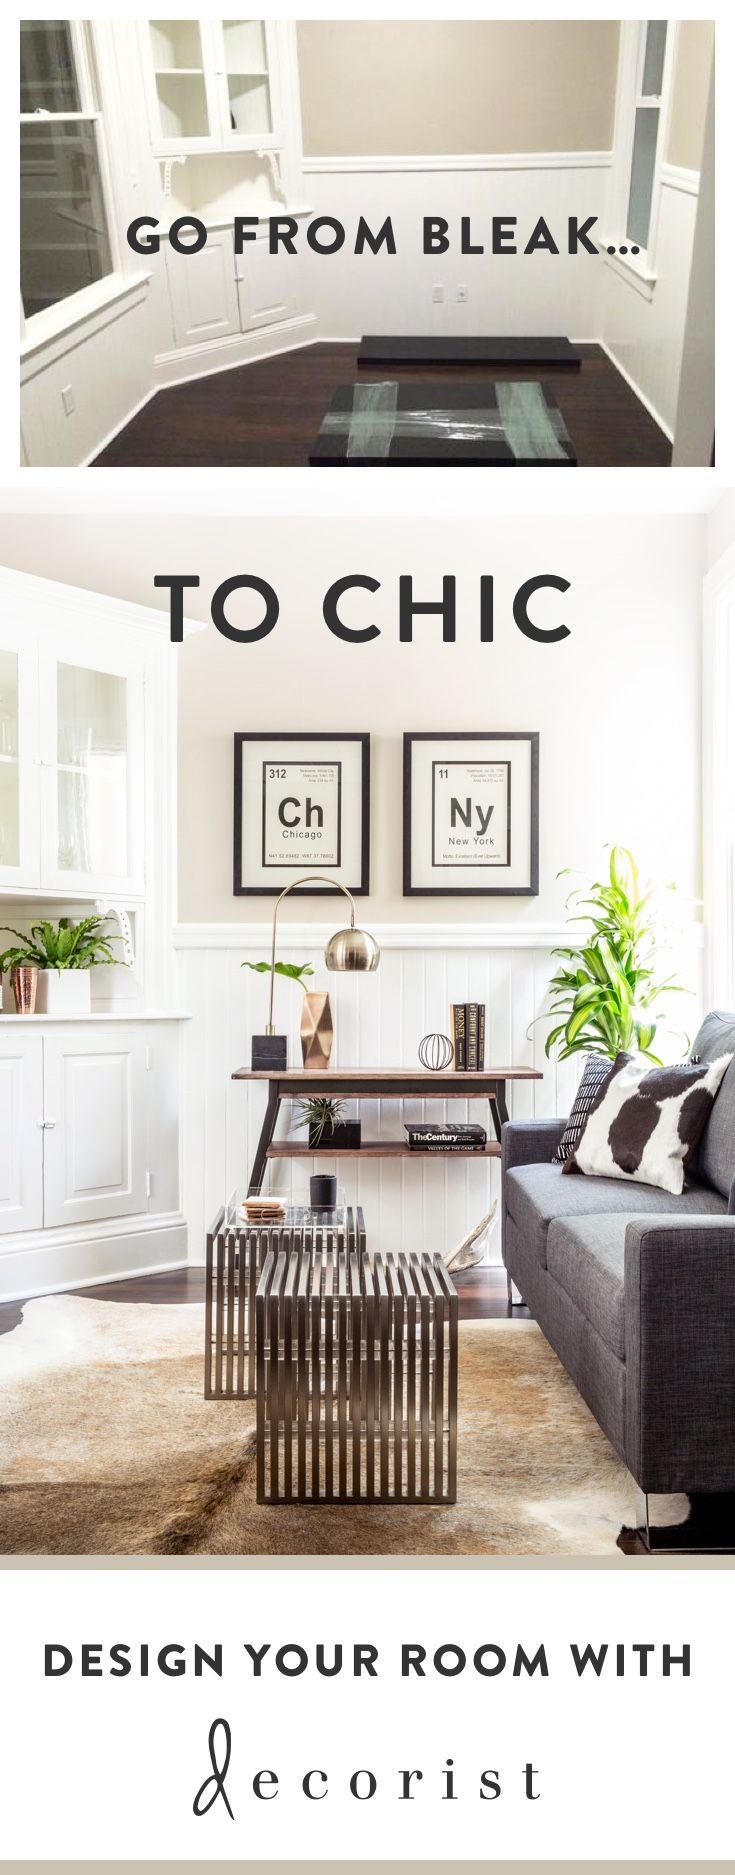 Top Interior Designers and Interior Decorators | Empty, Budgeting ...